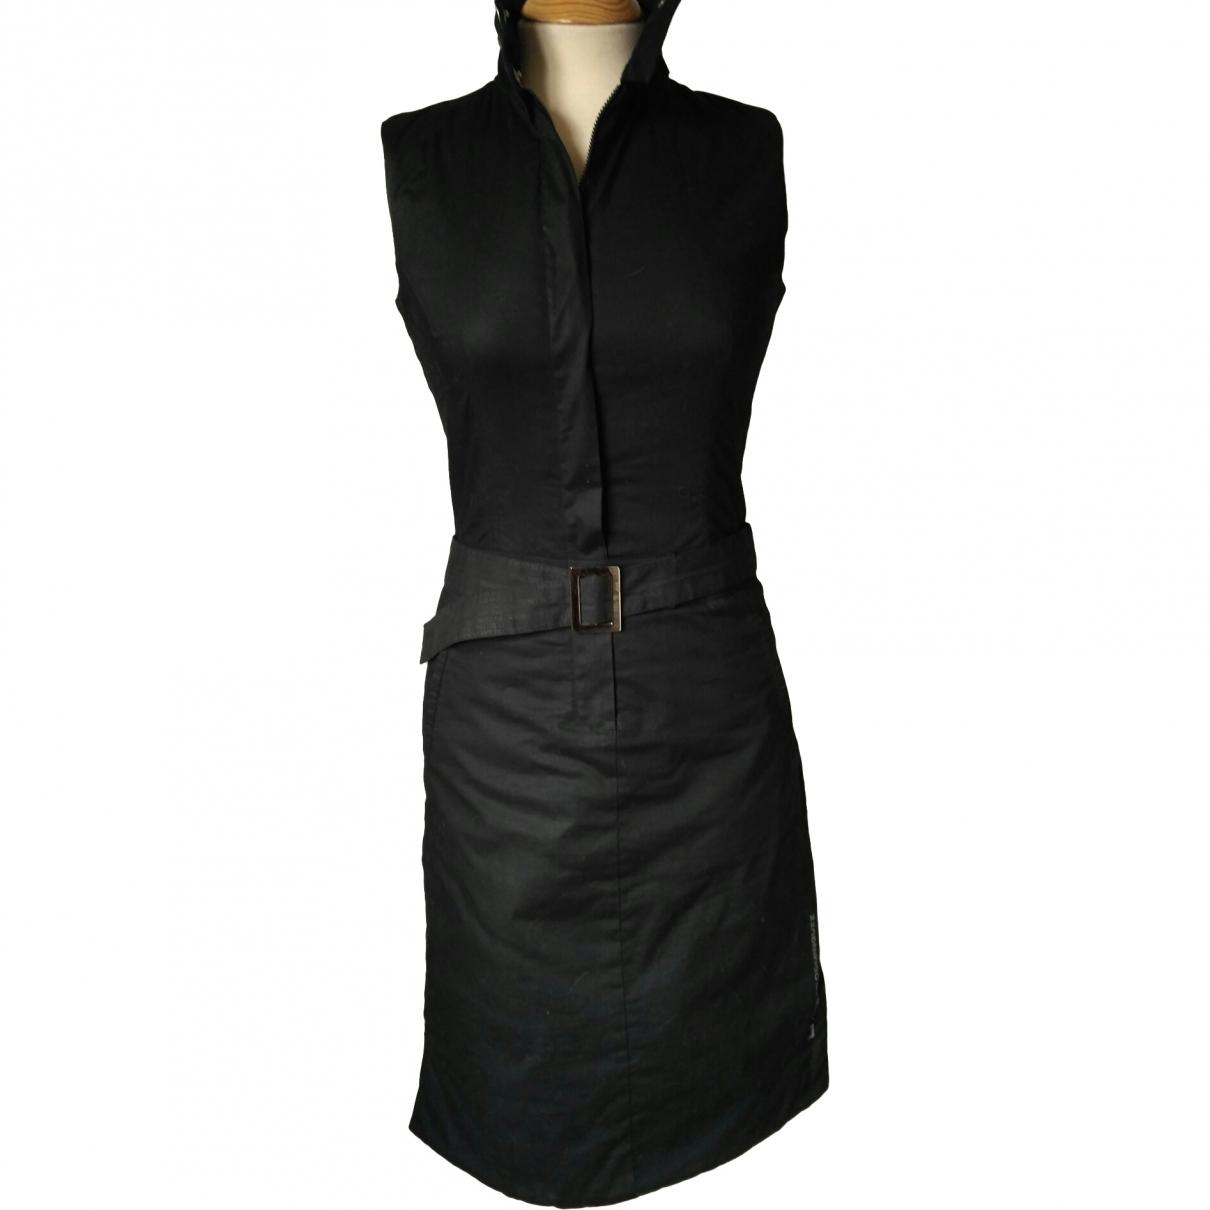 Adolfo Dominguez \N Kleid in  Schwarz Baumwolle - Elasthan